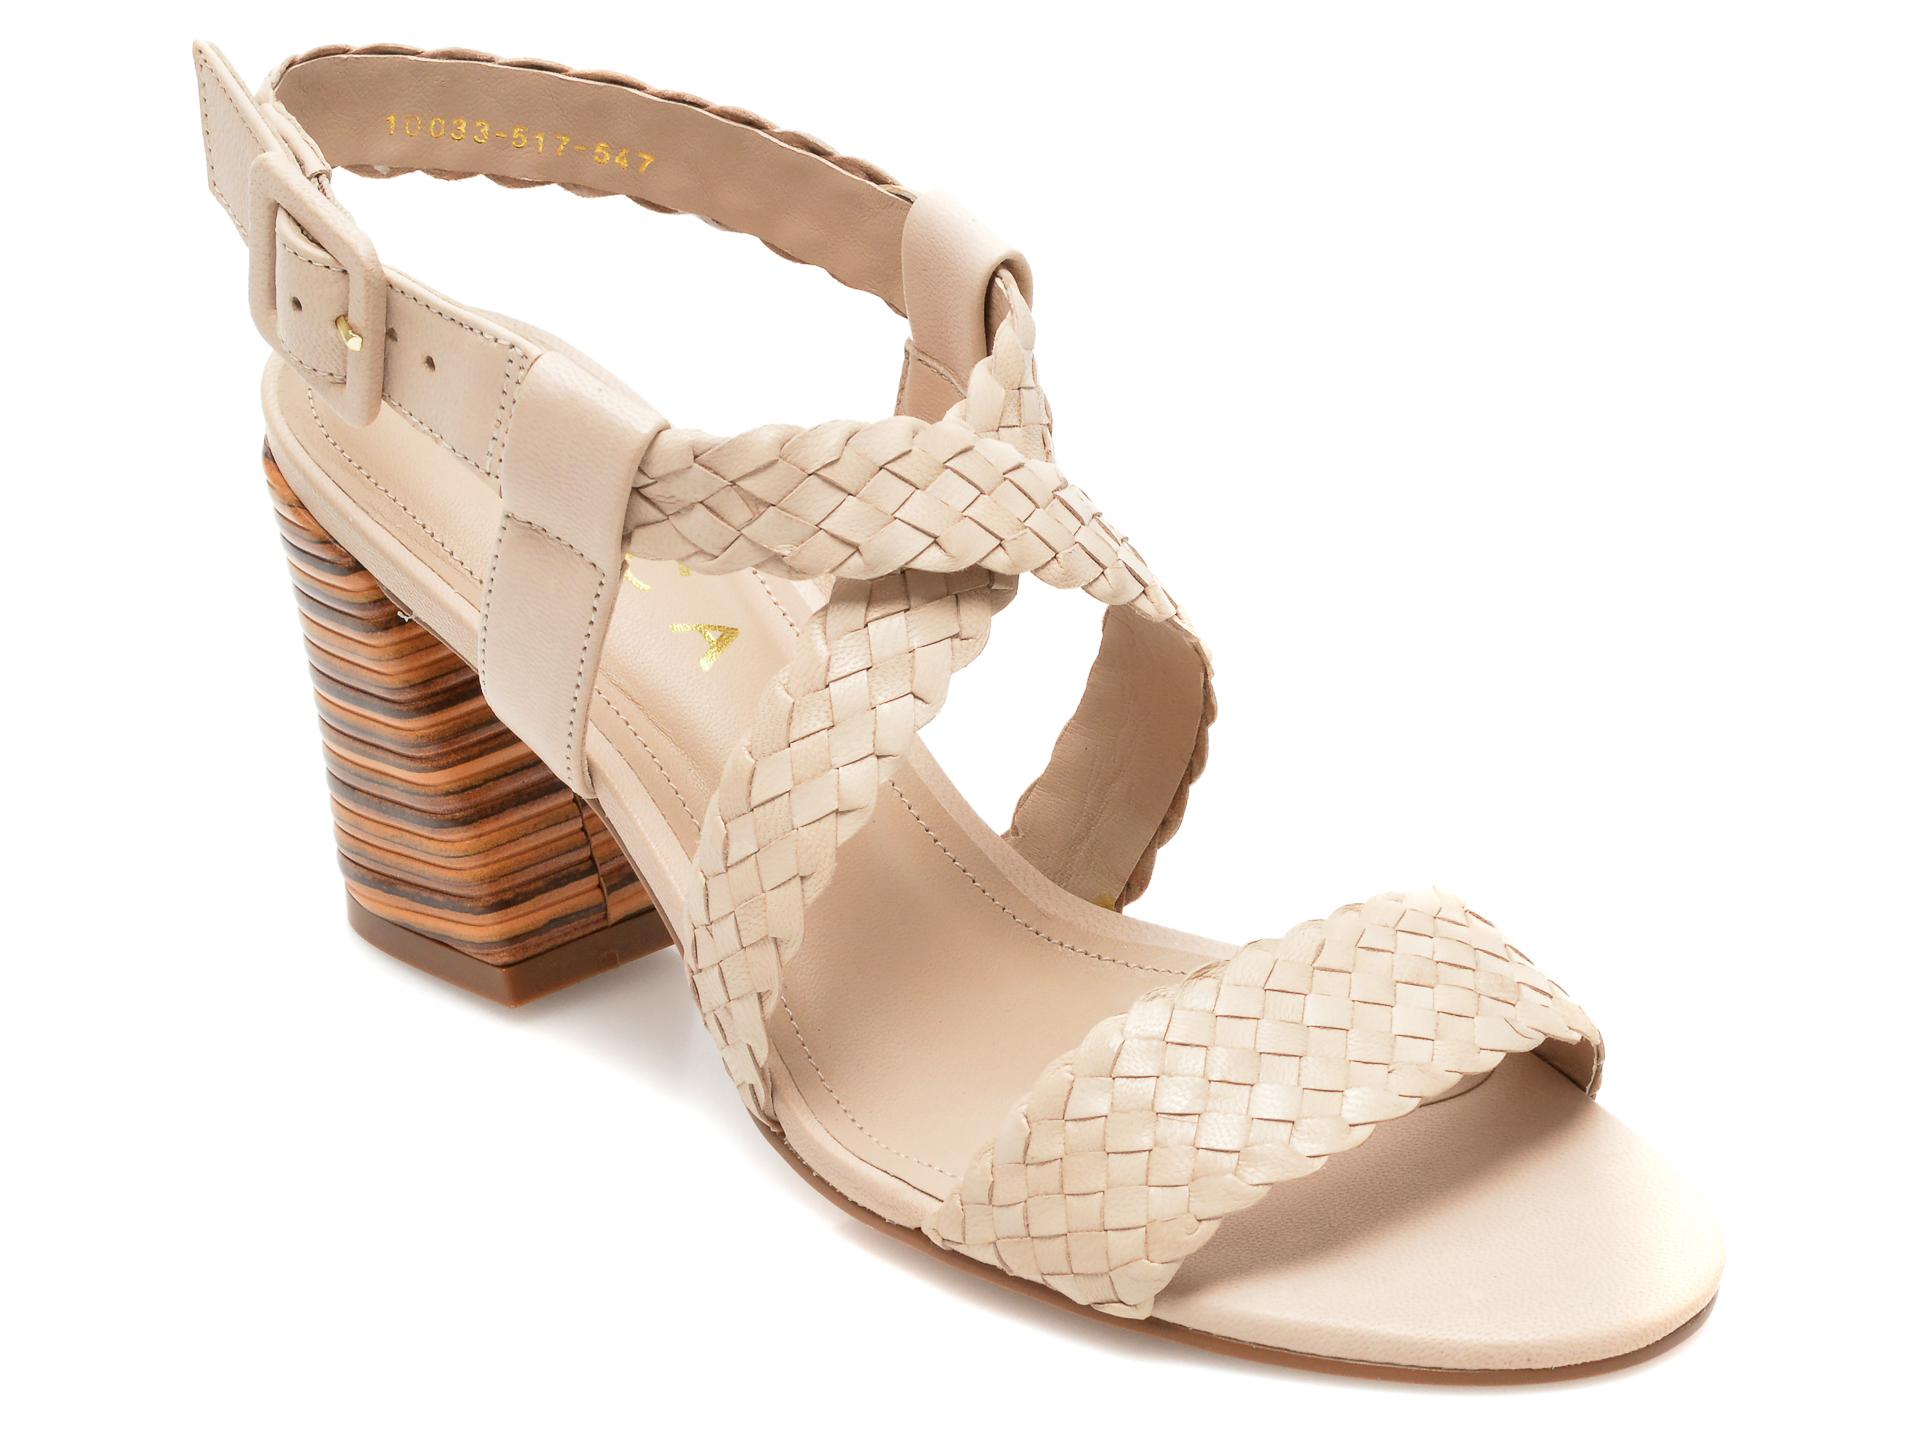 Sandale EPICA bej, 1003547, din piele naturala imagine otter.ro